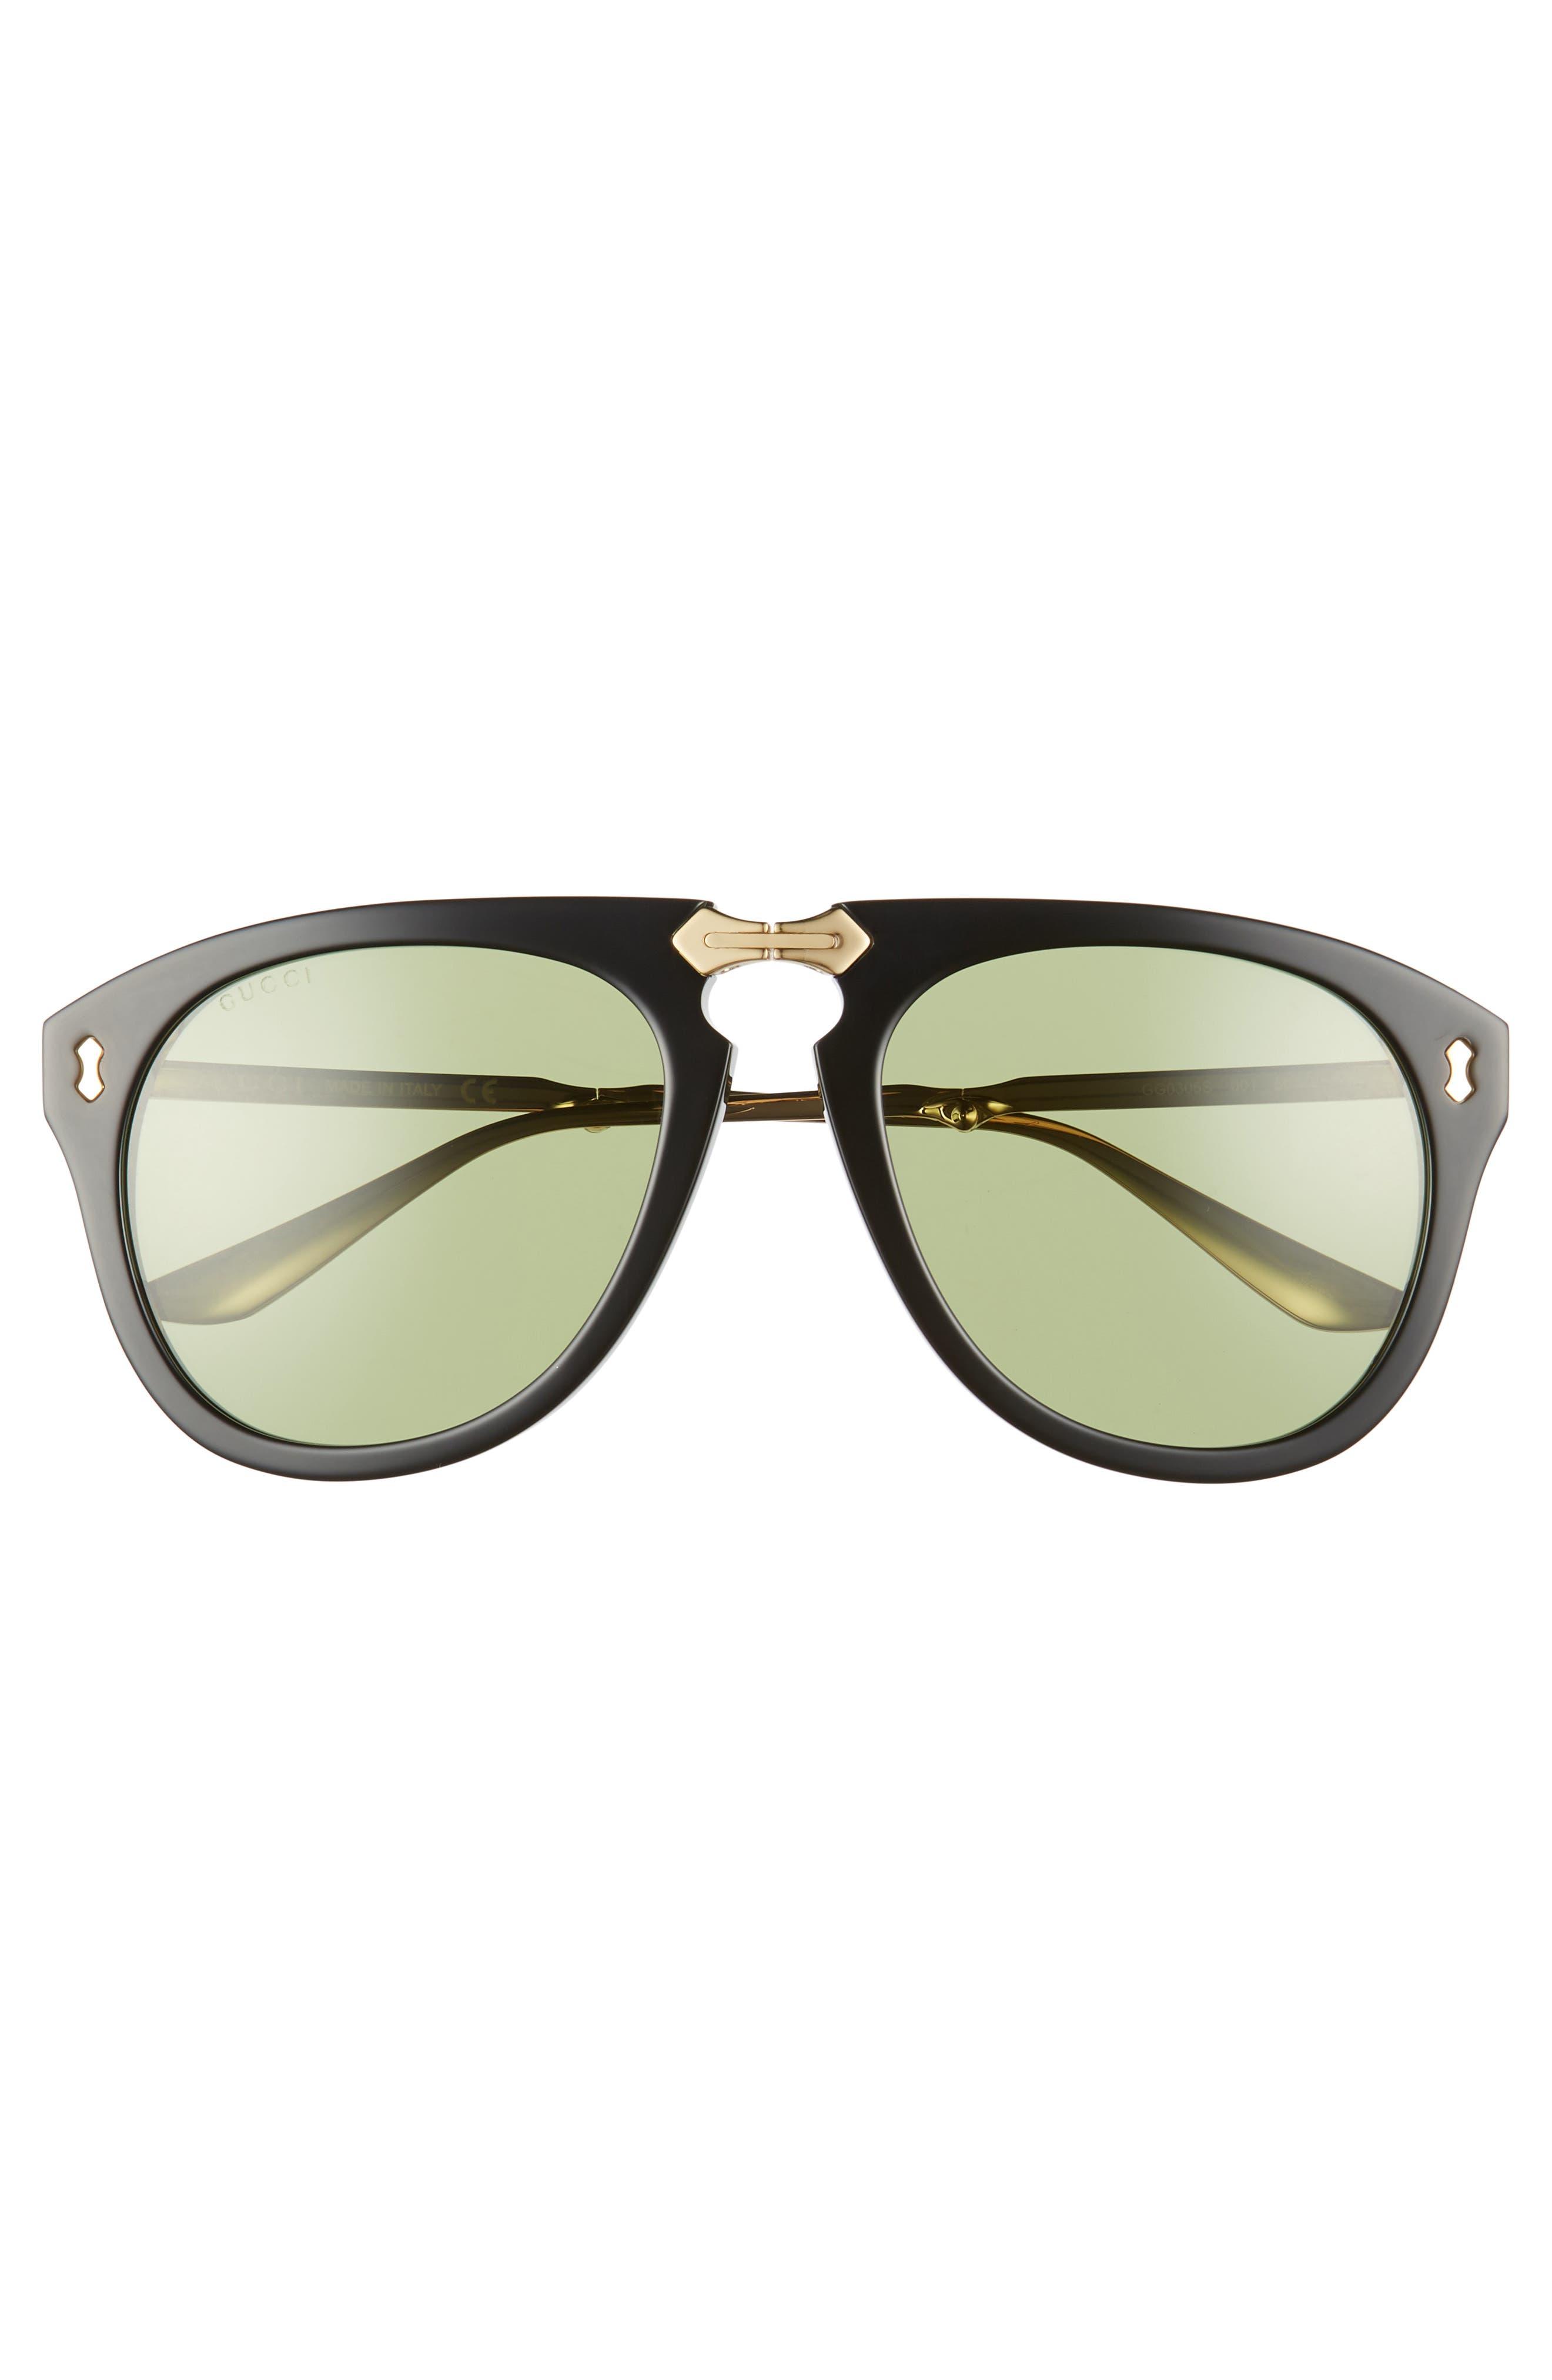 56mm Aviator Sunglasses,                             Alternate thumbnail 3, color,                             BLACK/ GOLD/ GREEN